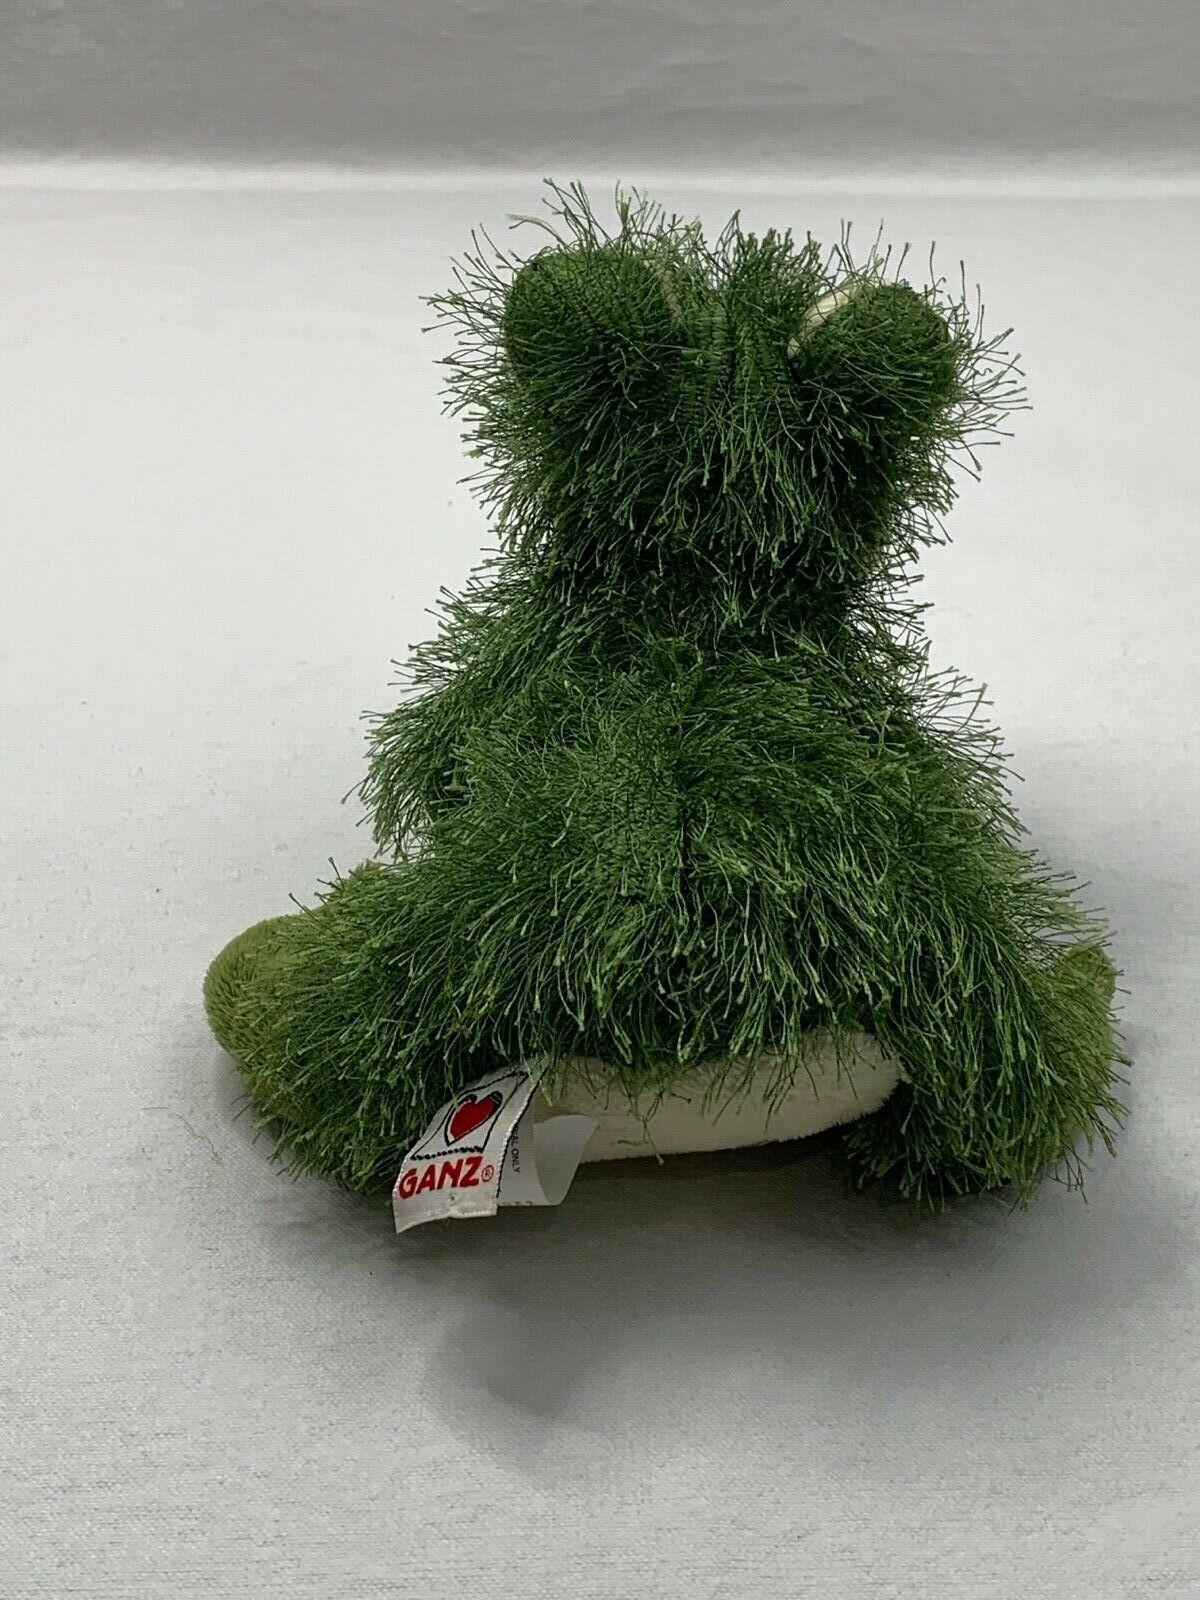 Ganz Webkinz Green Fuzzy Lil' Frog Plush Stuffed Animal No Code